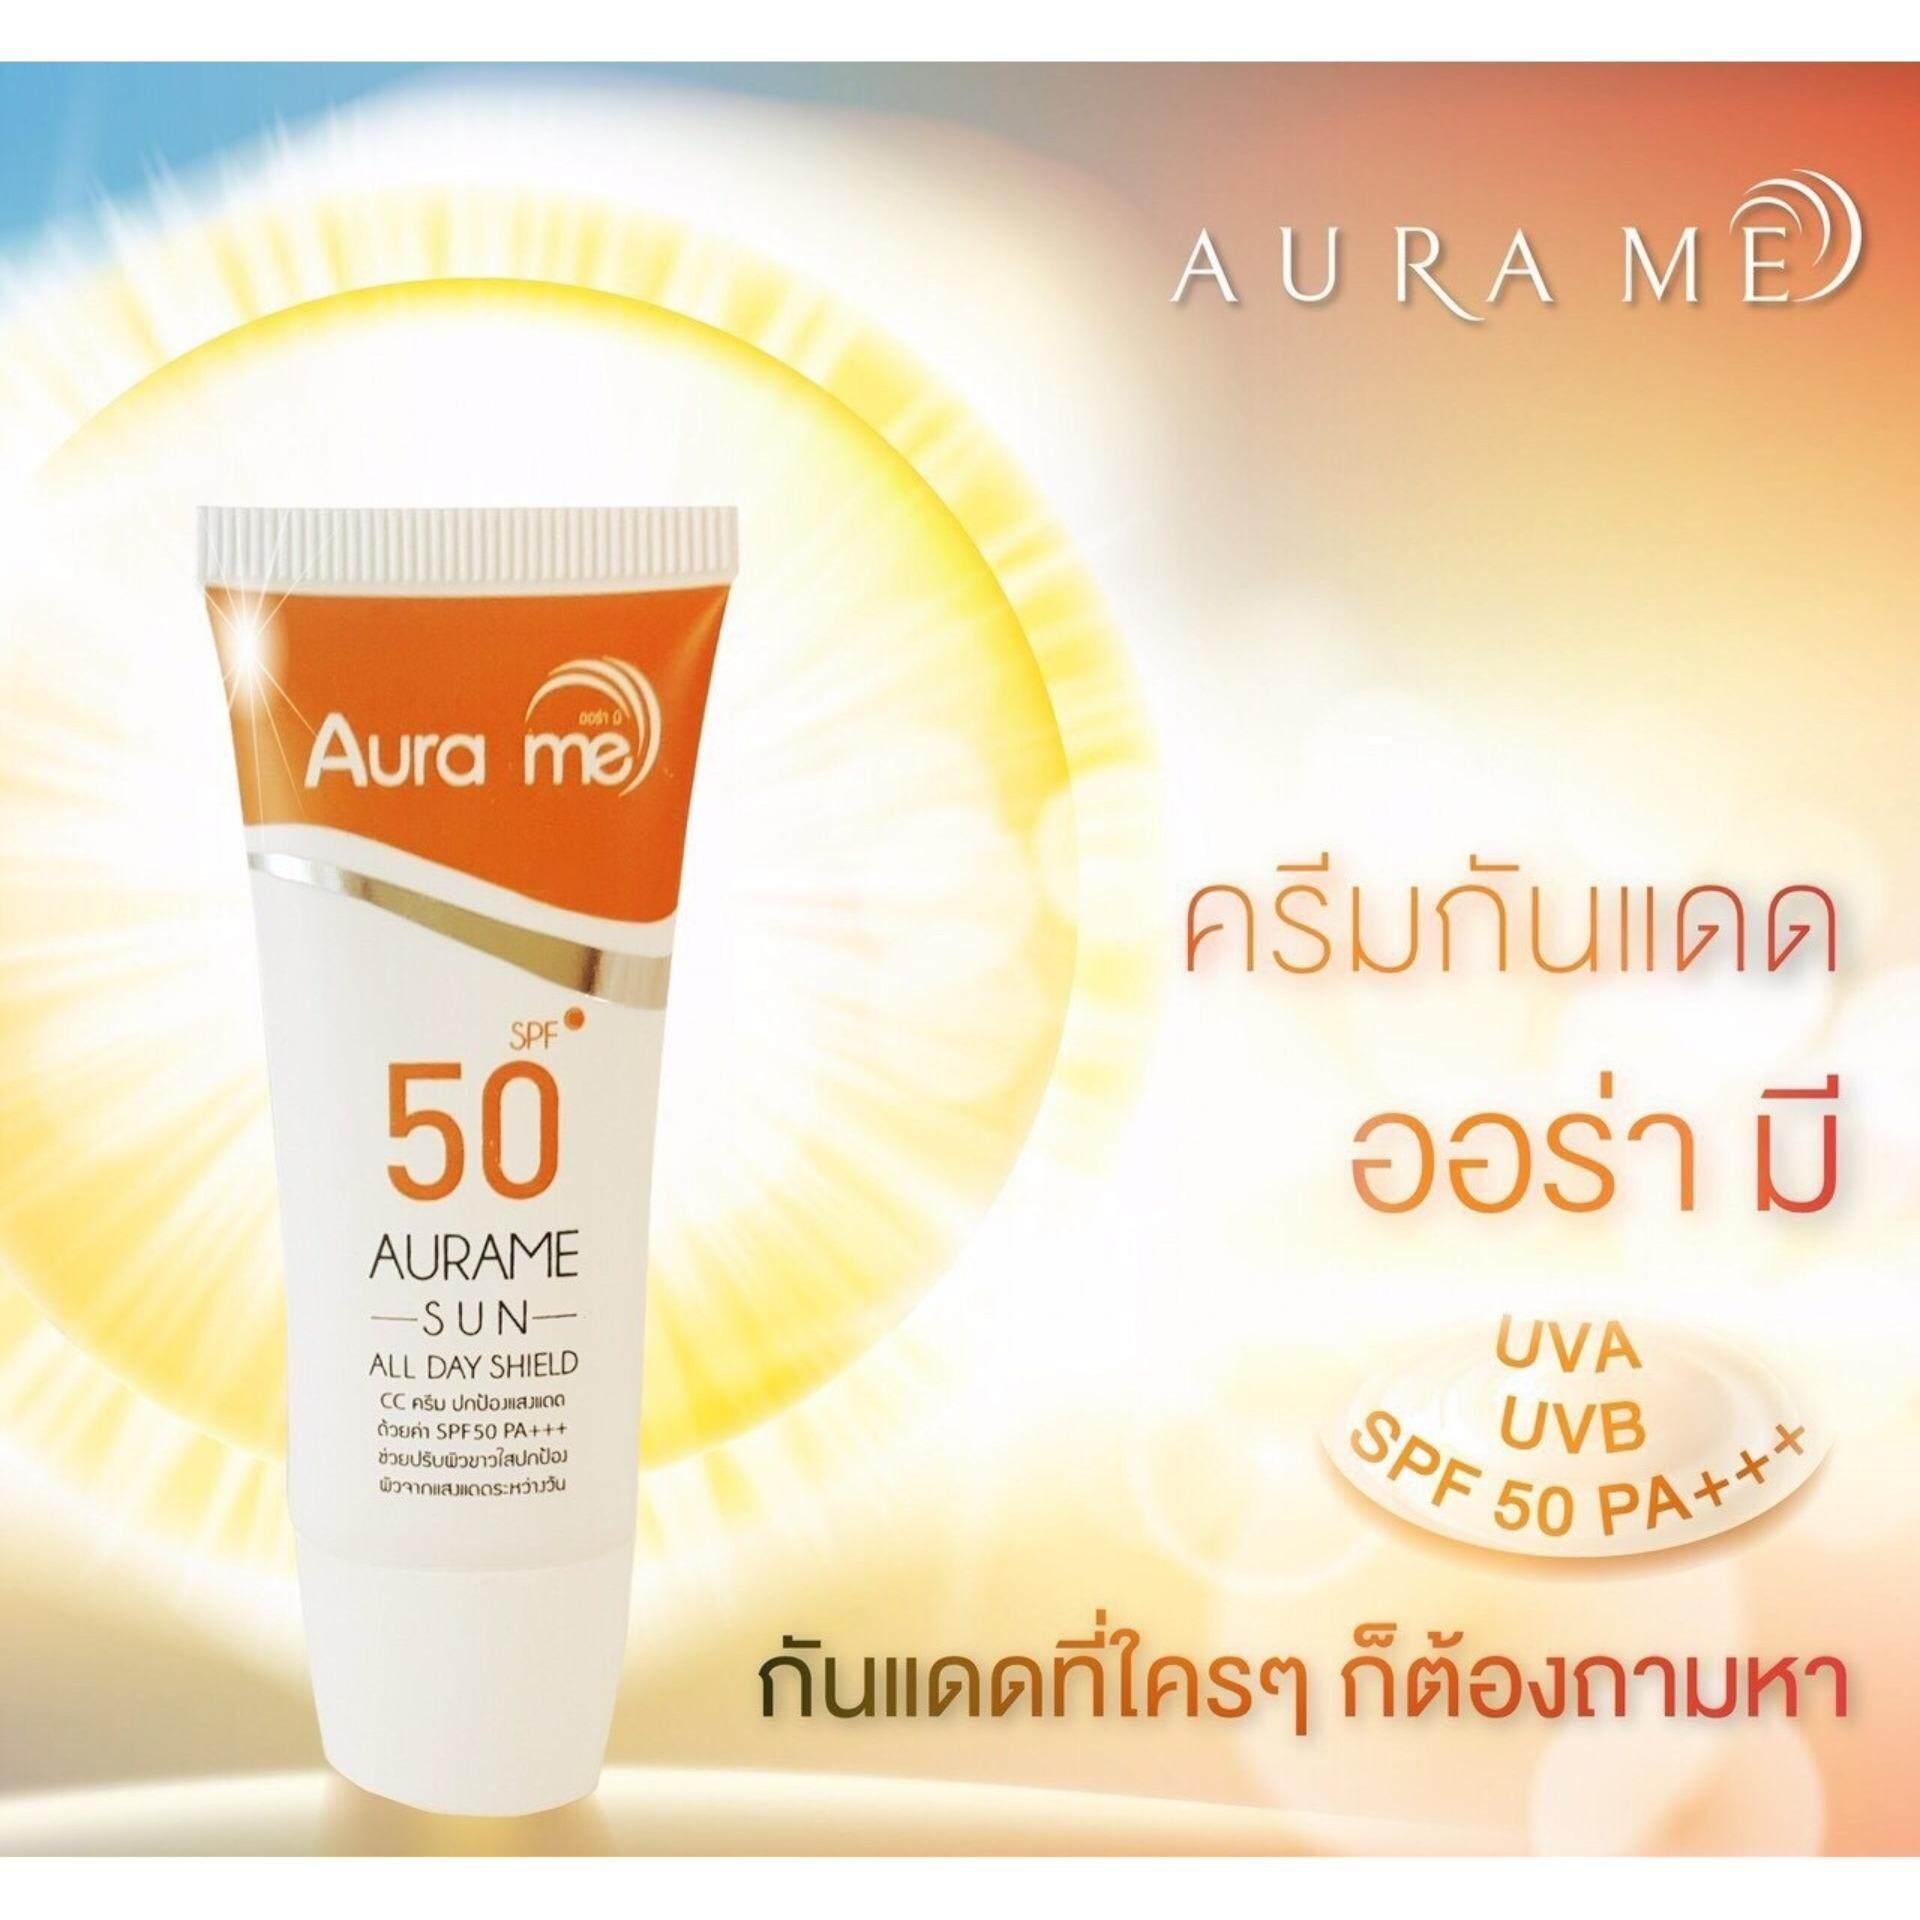 Aura Spf50 Aurame ครีมกันแดดออร่ามี สูตรกันน้ำ Me Pa